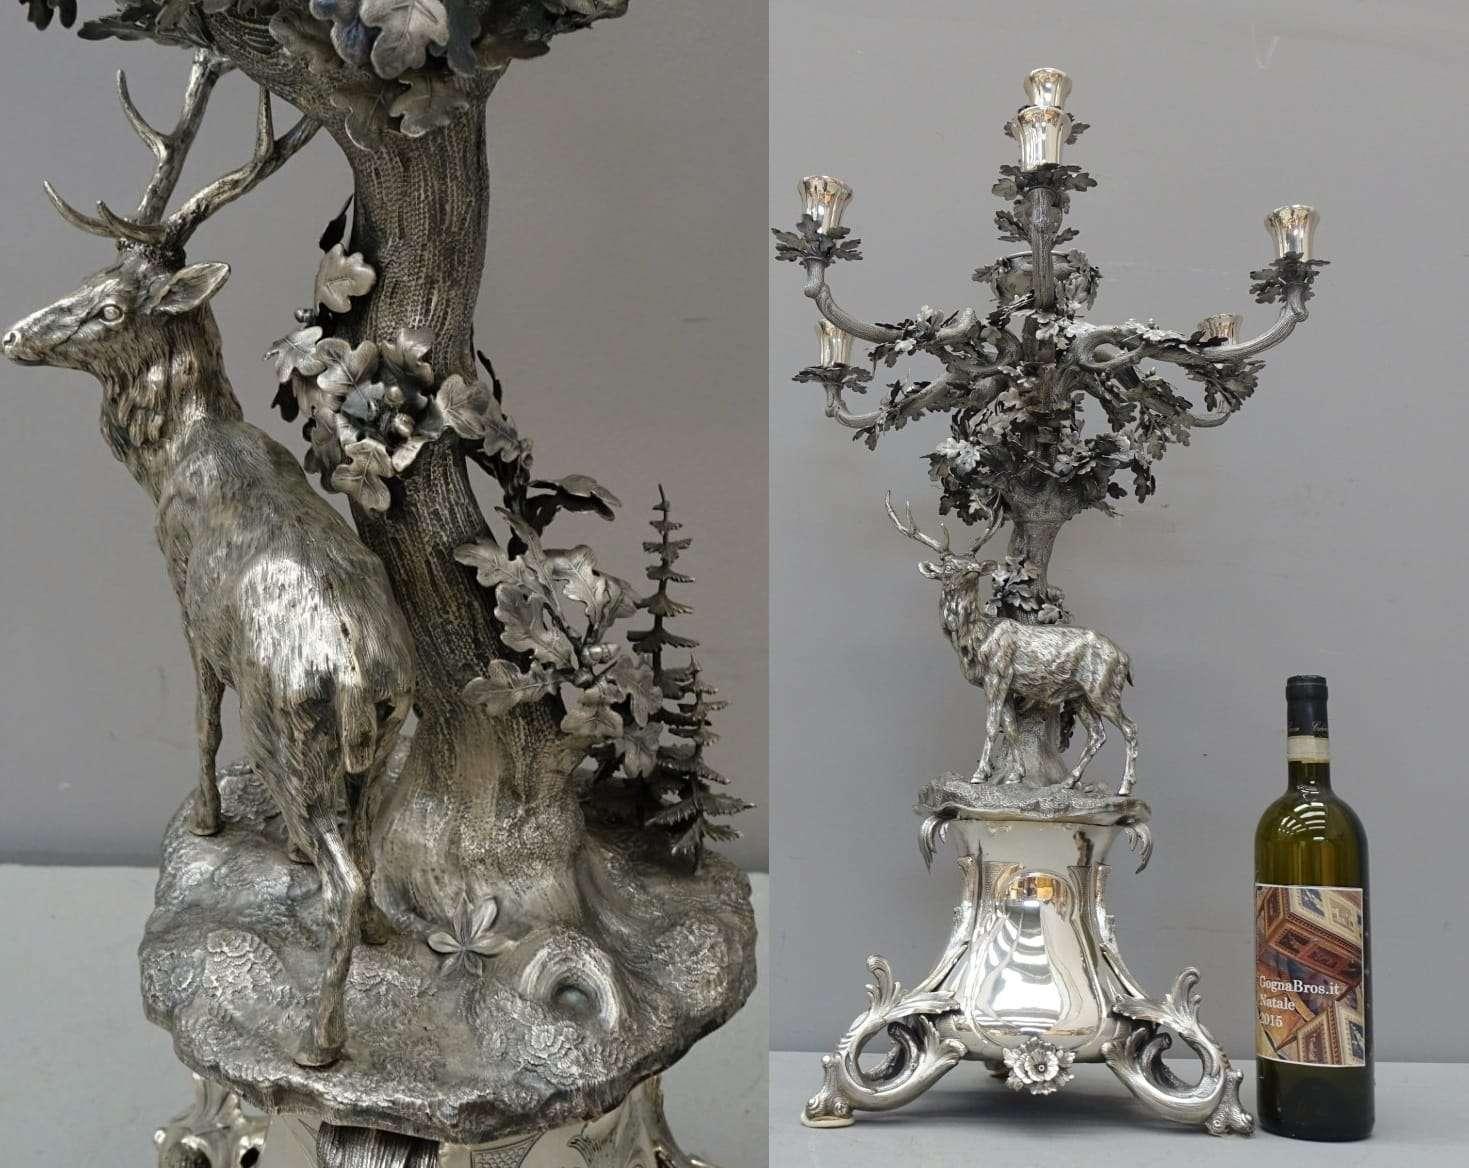 Candeliere candelabro centrotavola cervo in argento massiccio 0717019